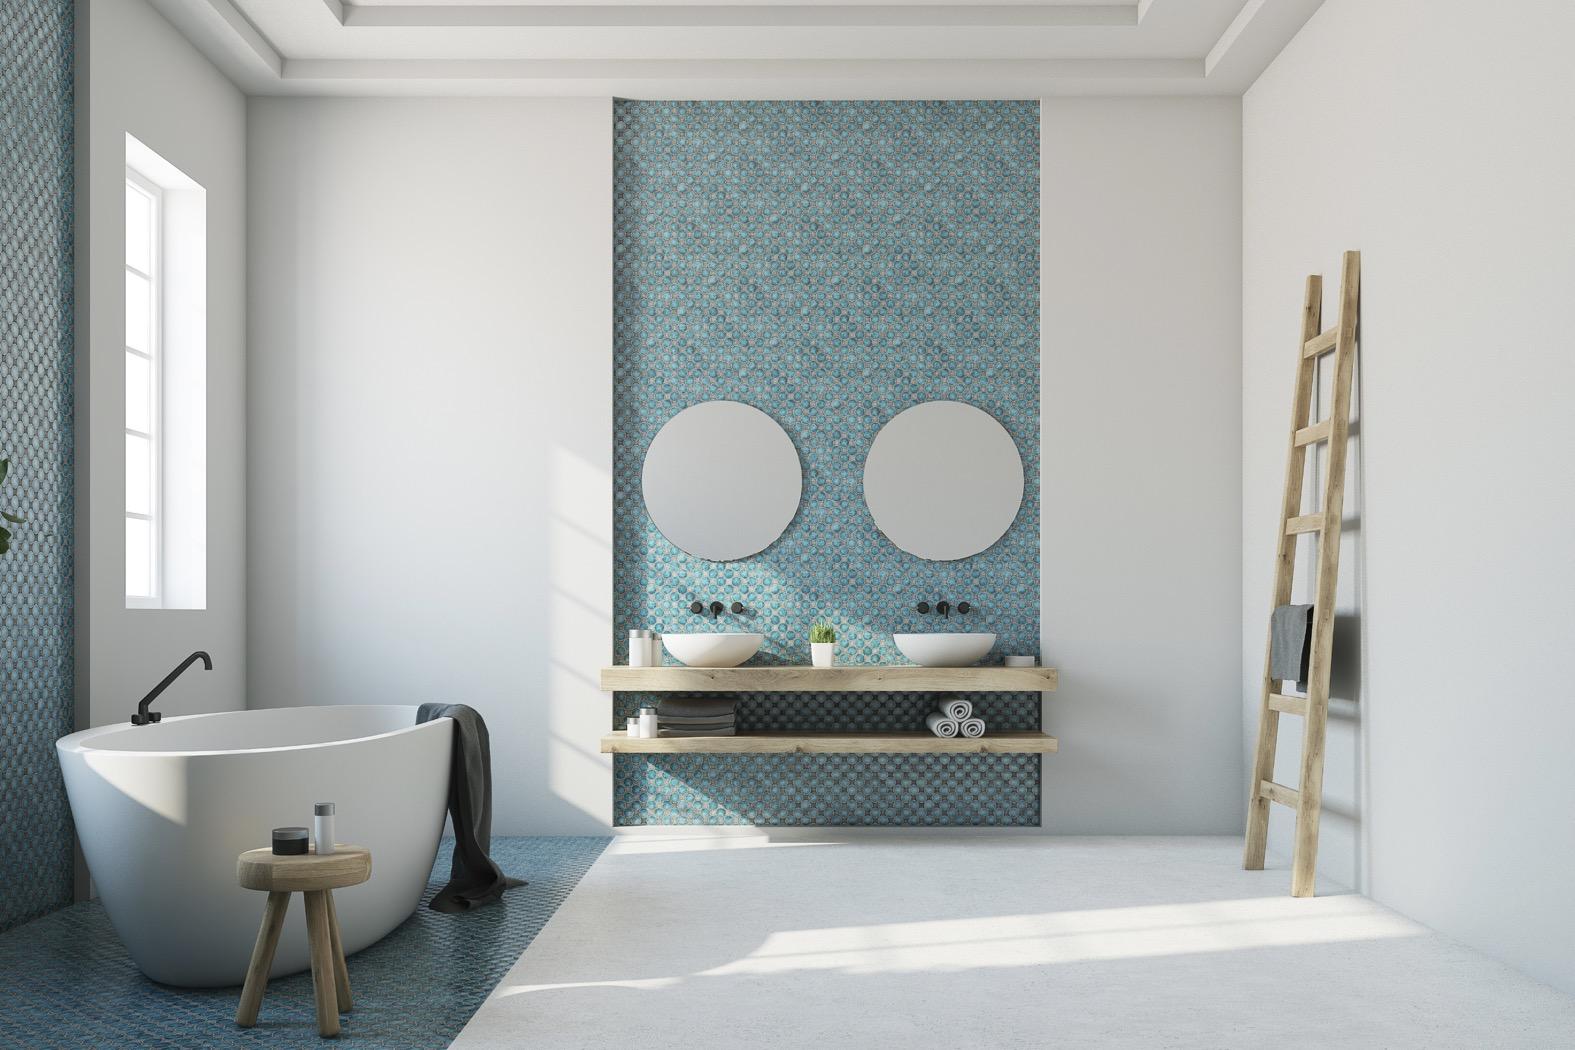 7 Jenis Keramik Dinding Rumah Anti Mainstream